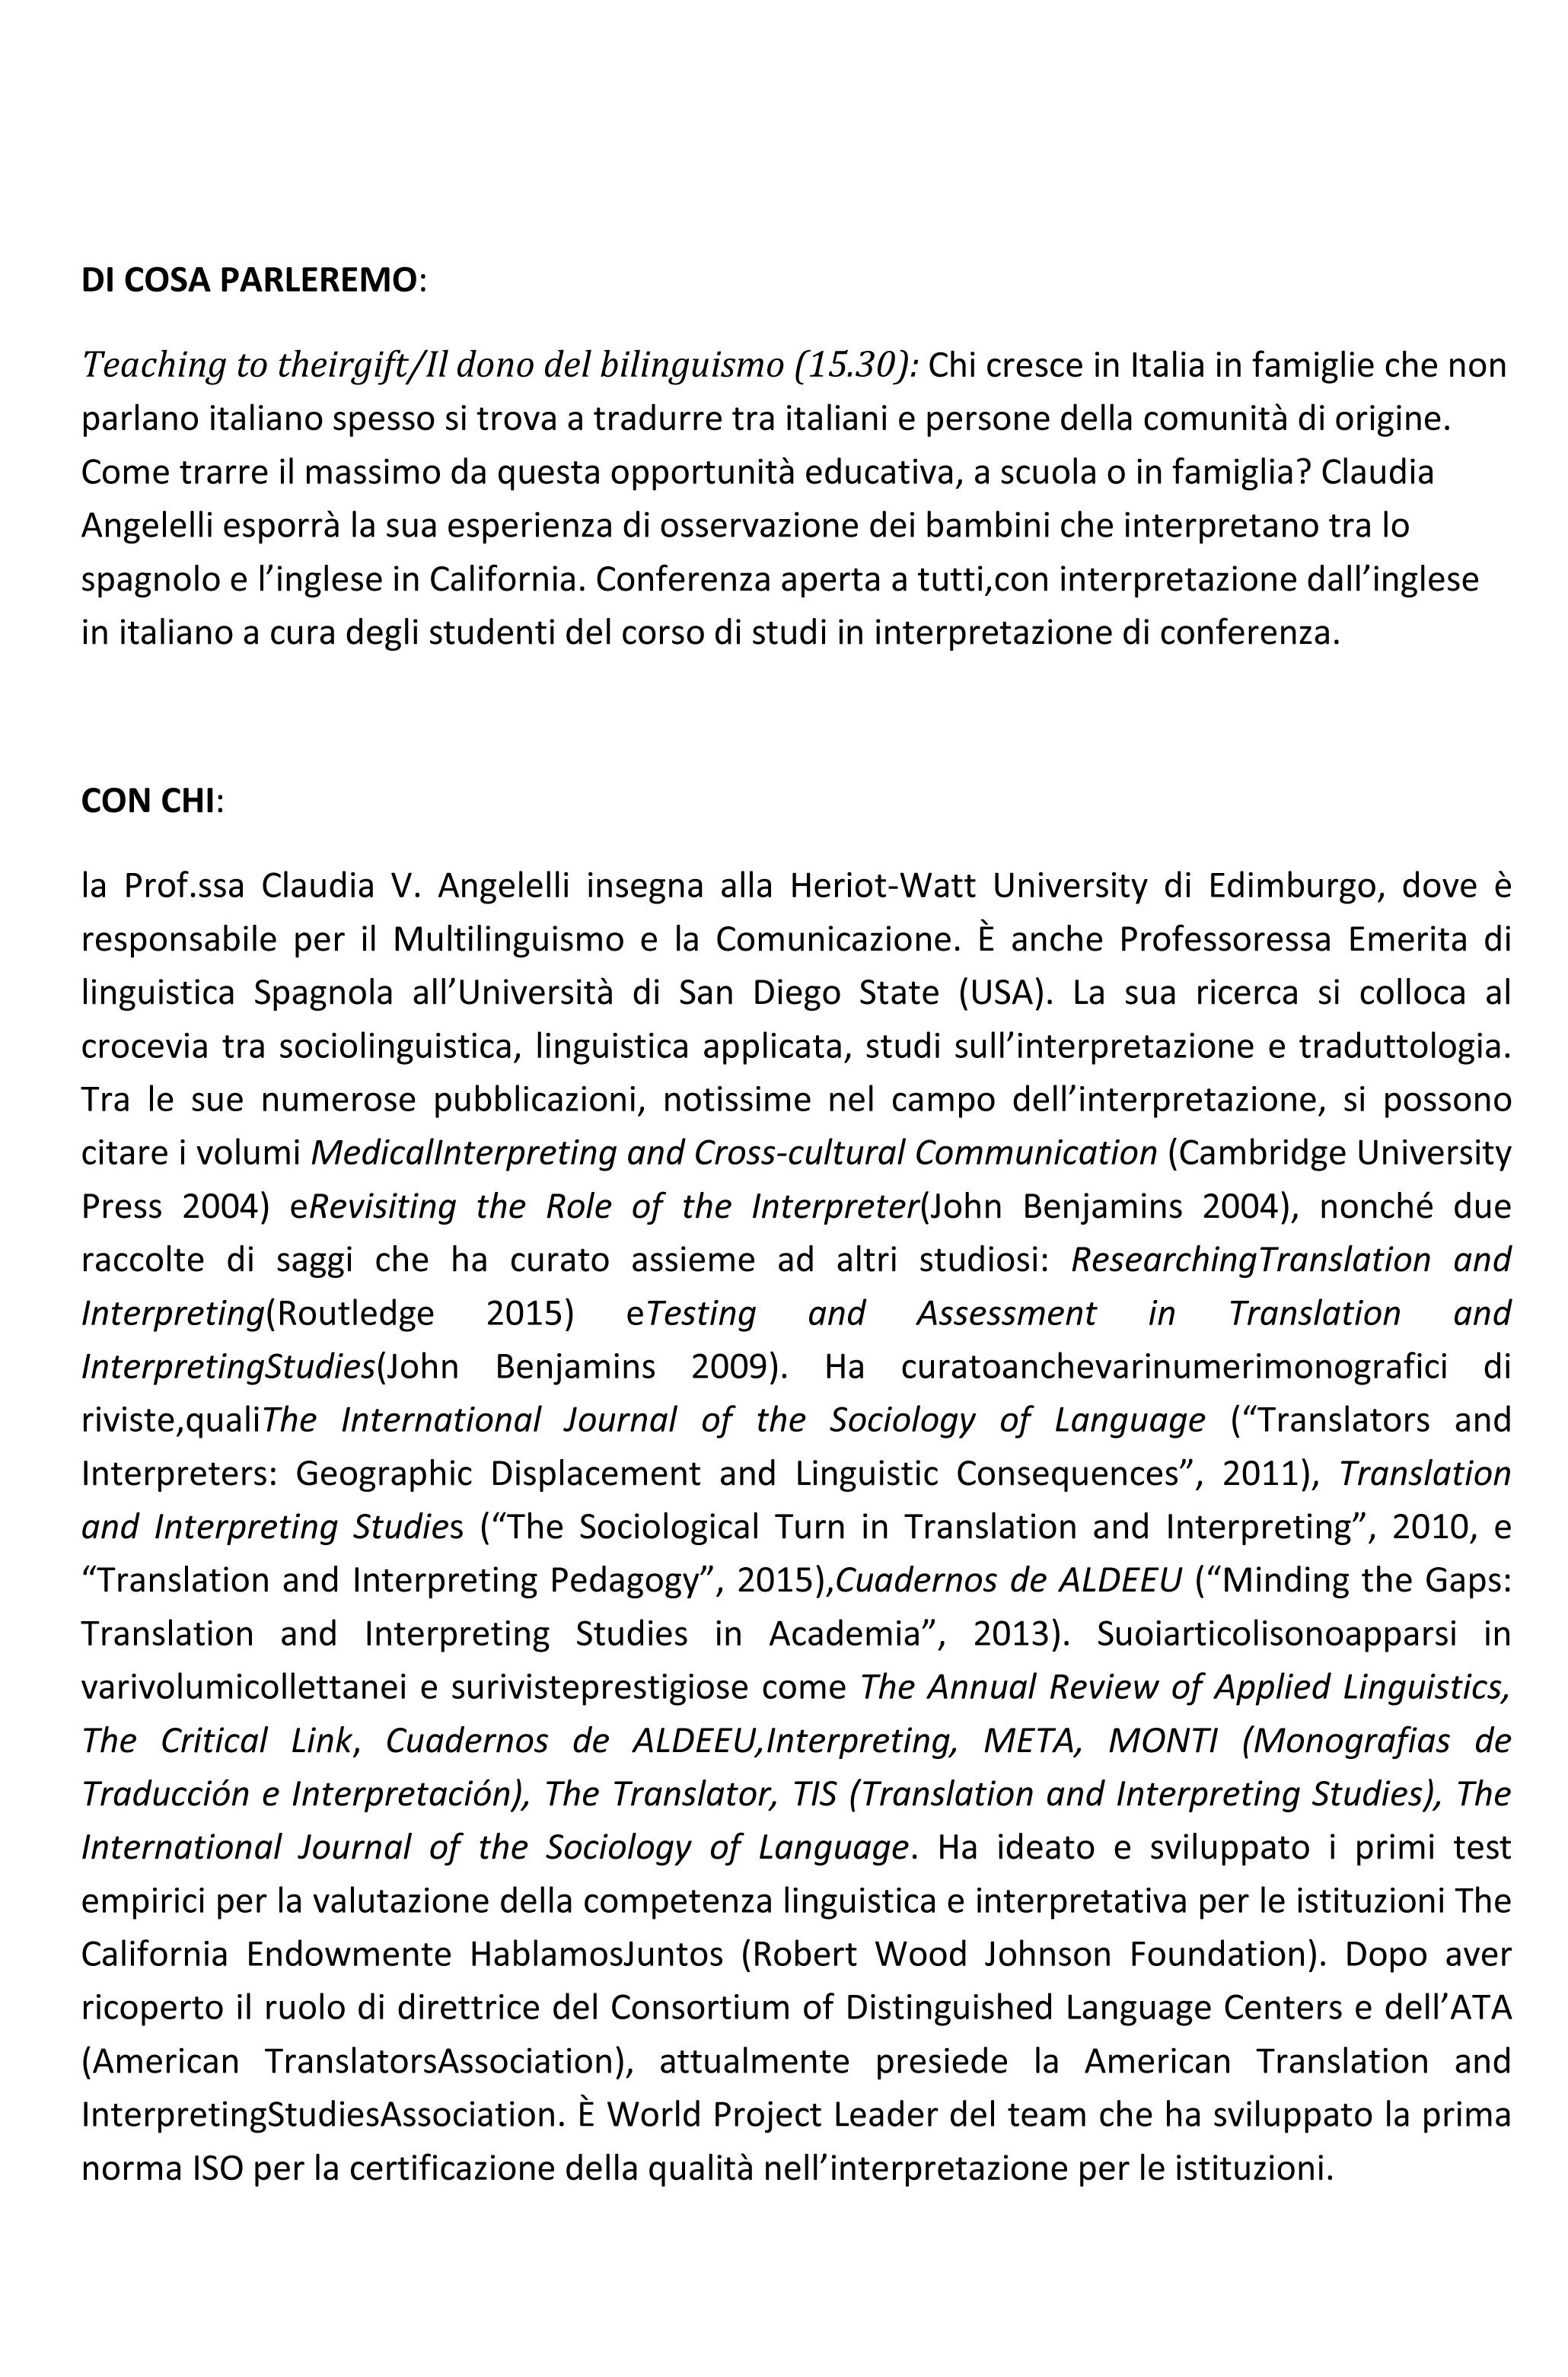 conferenza Angelelli